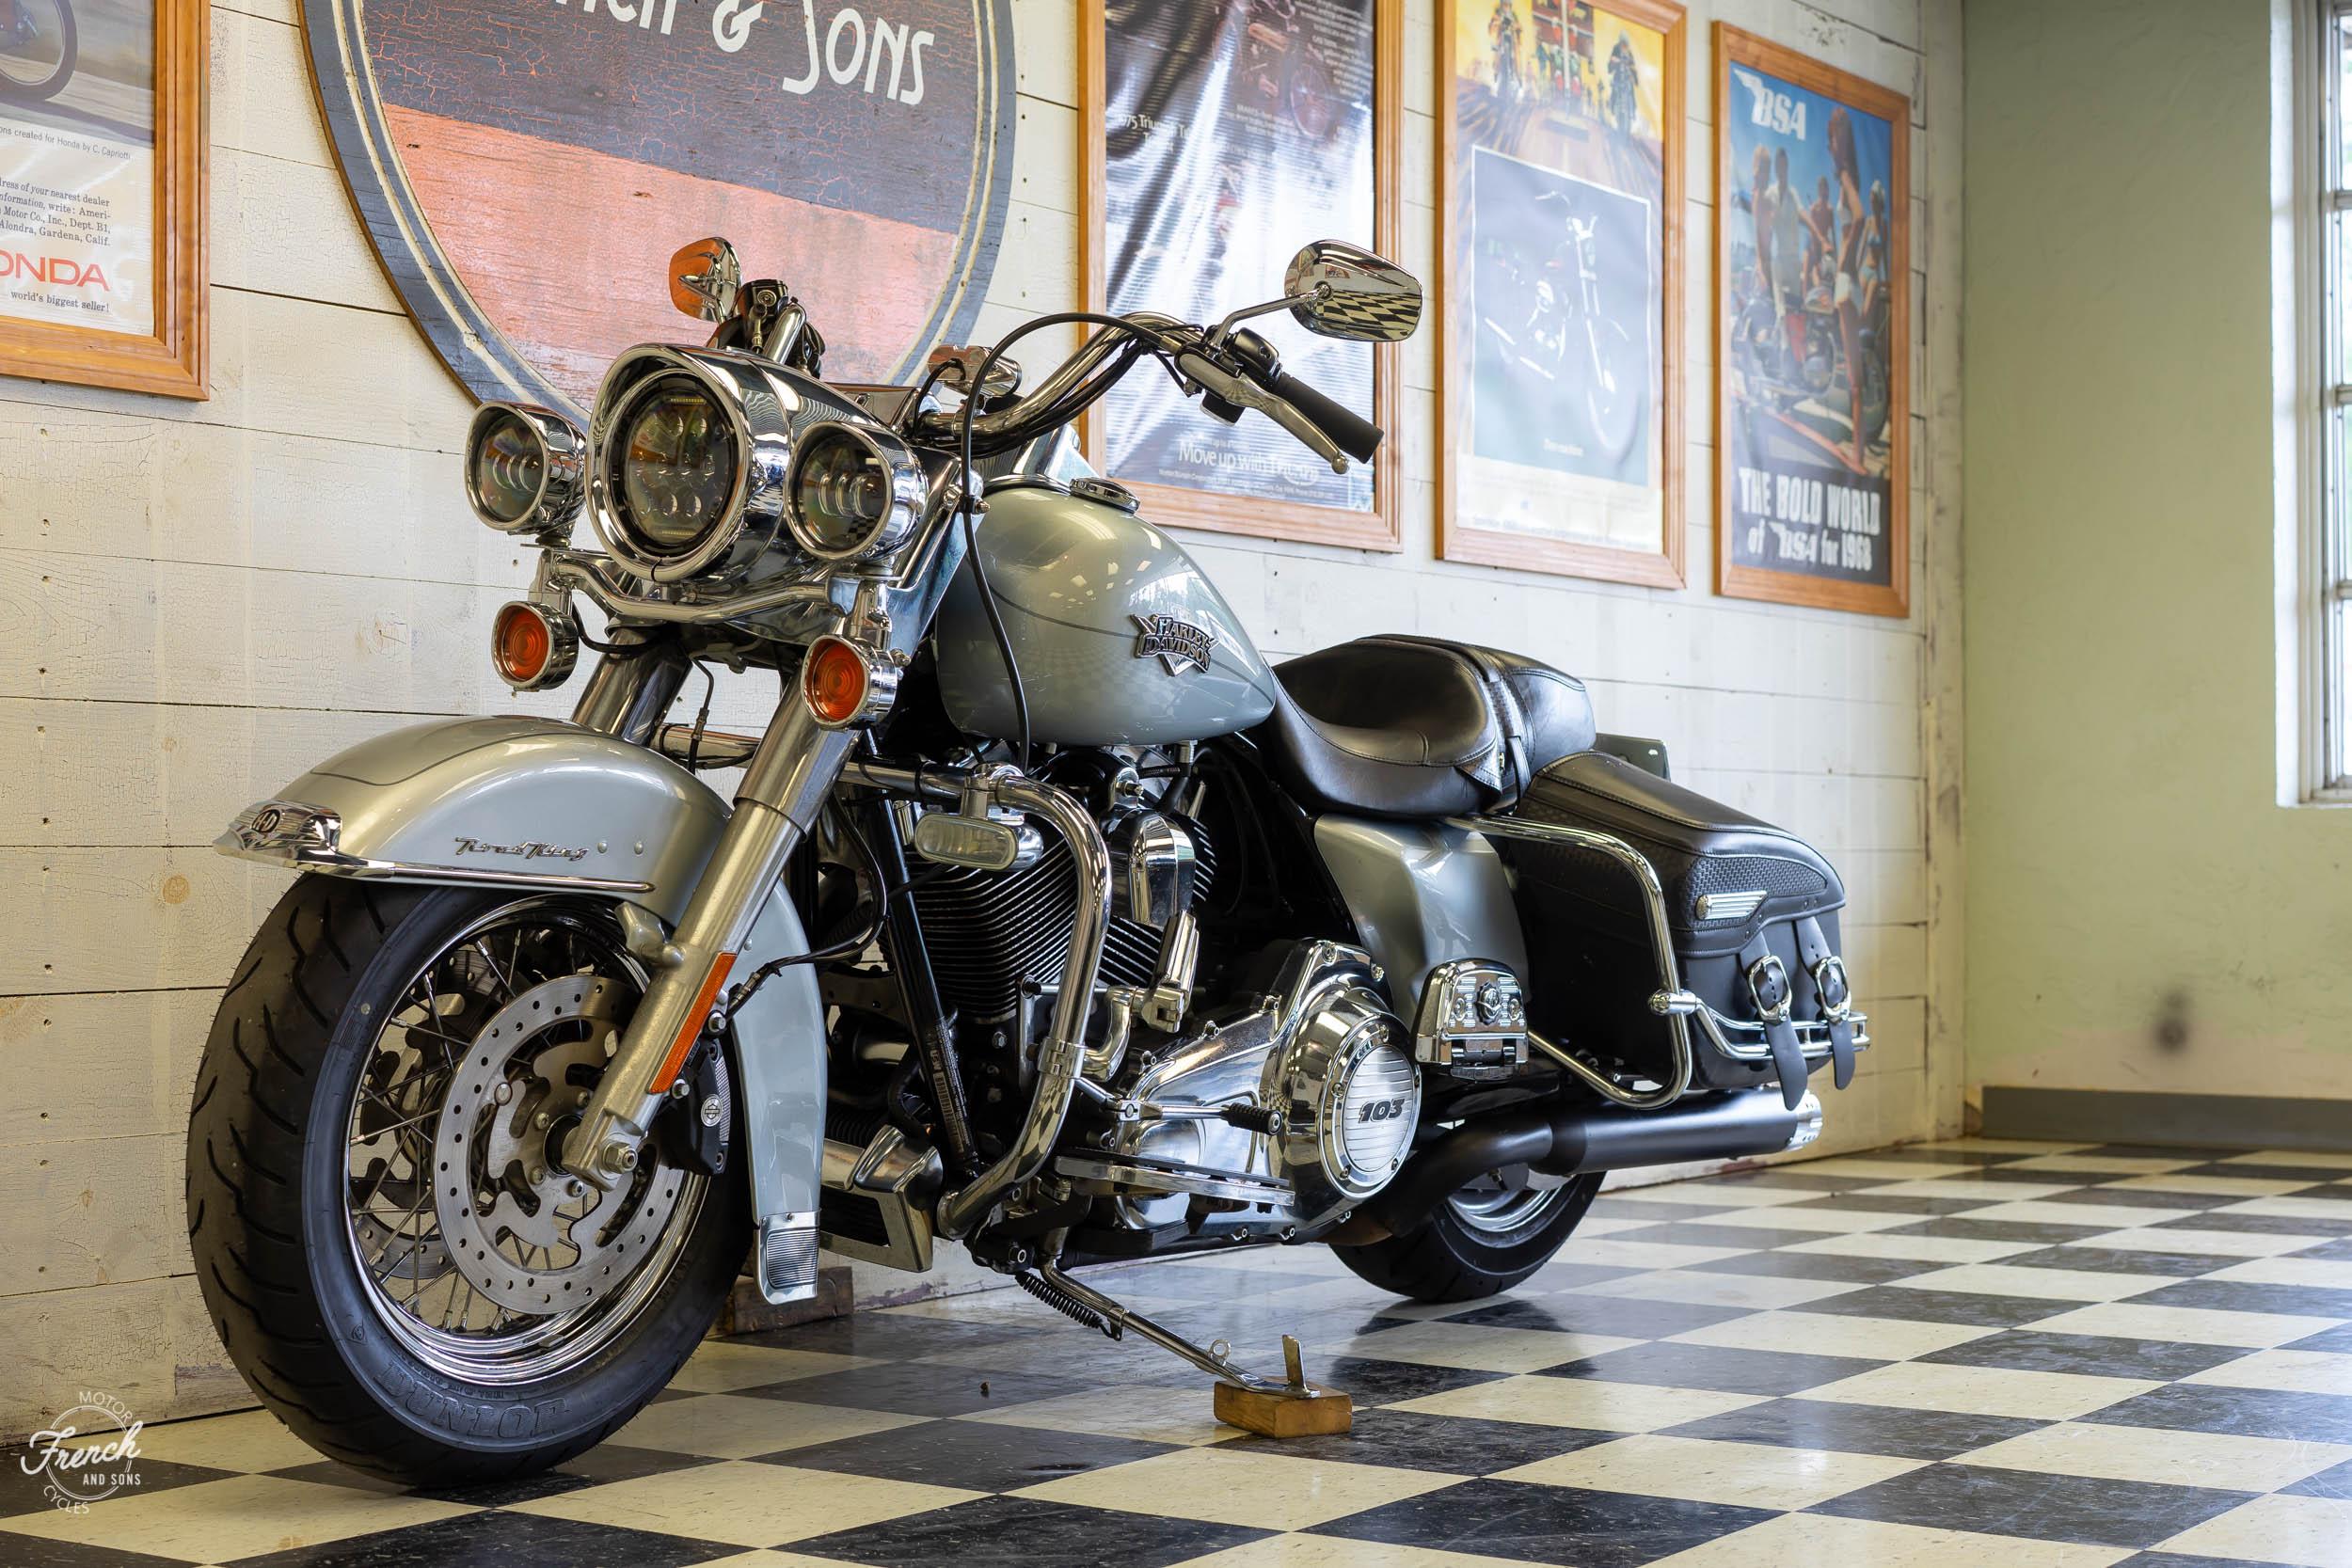 2011_Harley_davidson_road_king_silver-21.jpg